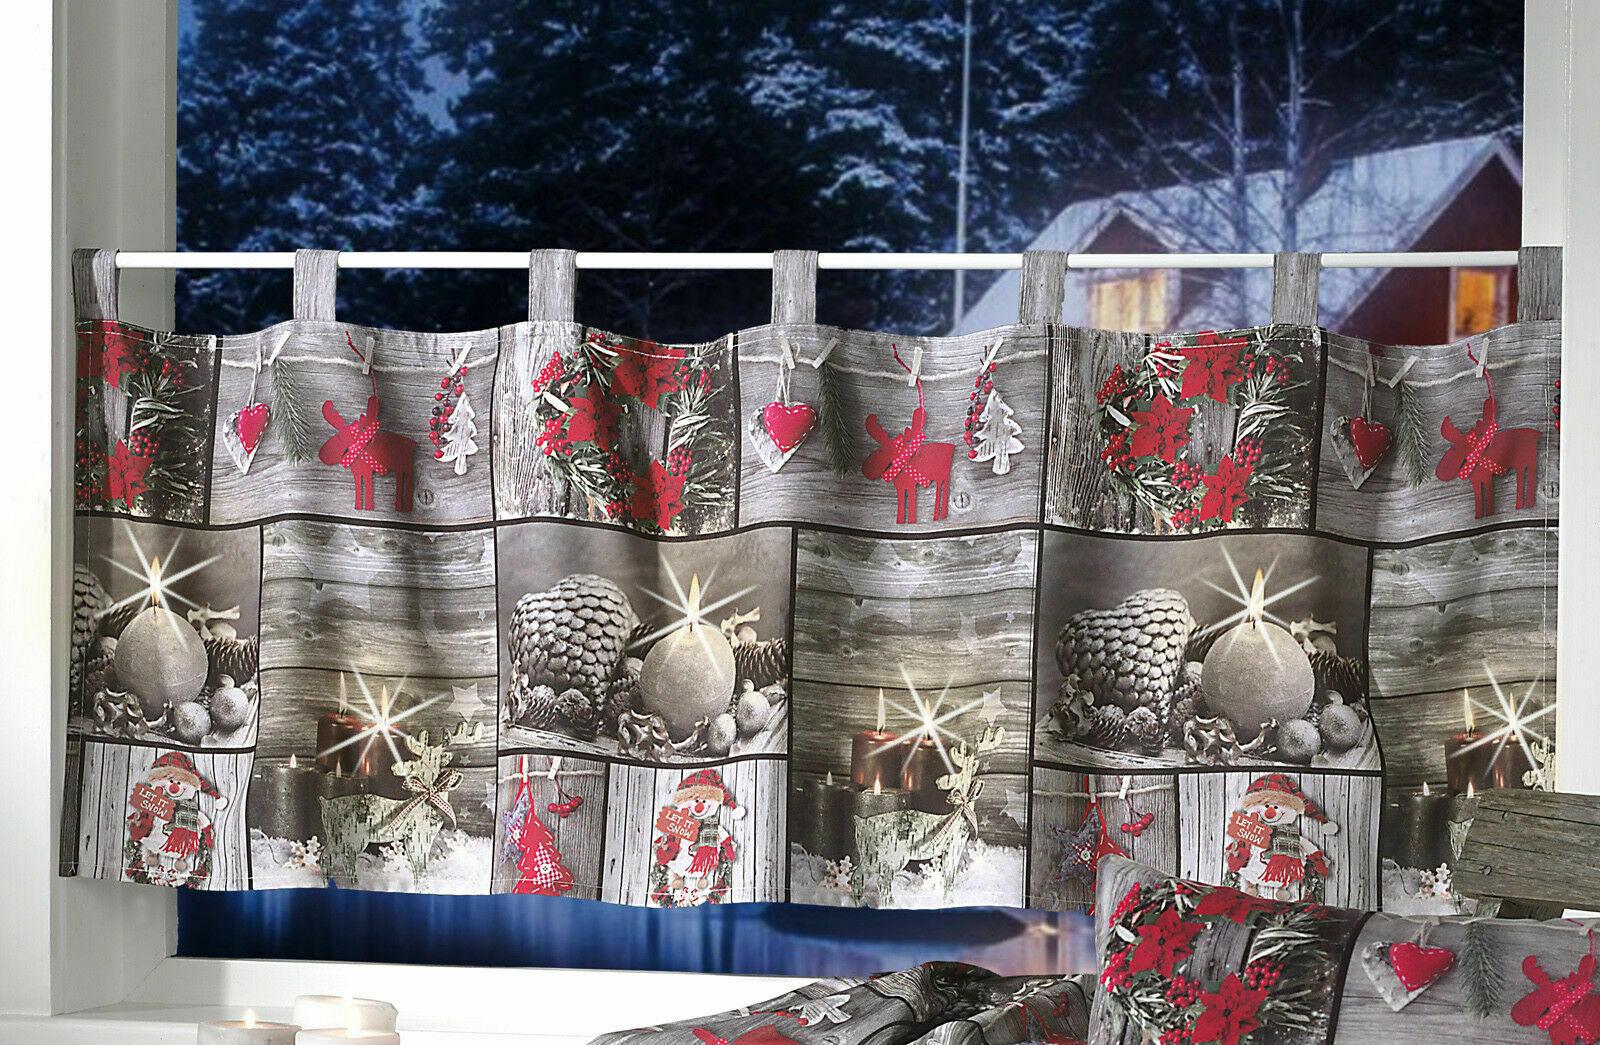 Full Size of Blickdichte Scheibengardinen 60 Cm Hoch Led Scheibengardine Weihnachten Weihnachtsgardine Beleuchtung Deko Bett Weiß 160x200 Schlafsofa Liegefläche Regal 50 Wohnzimmer Blickdichte Scheibengardinen 60 Cm Hoch